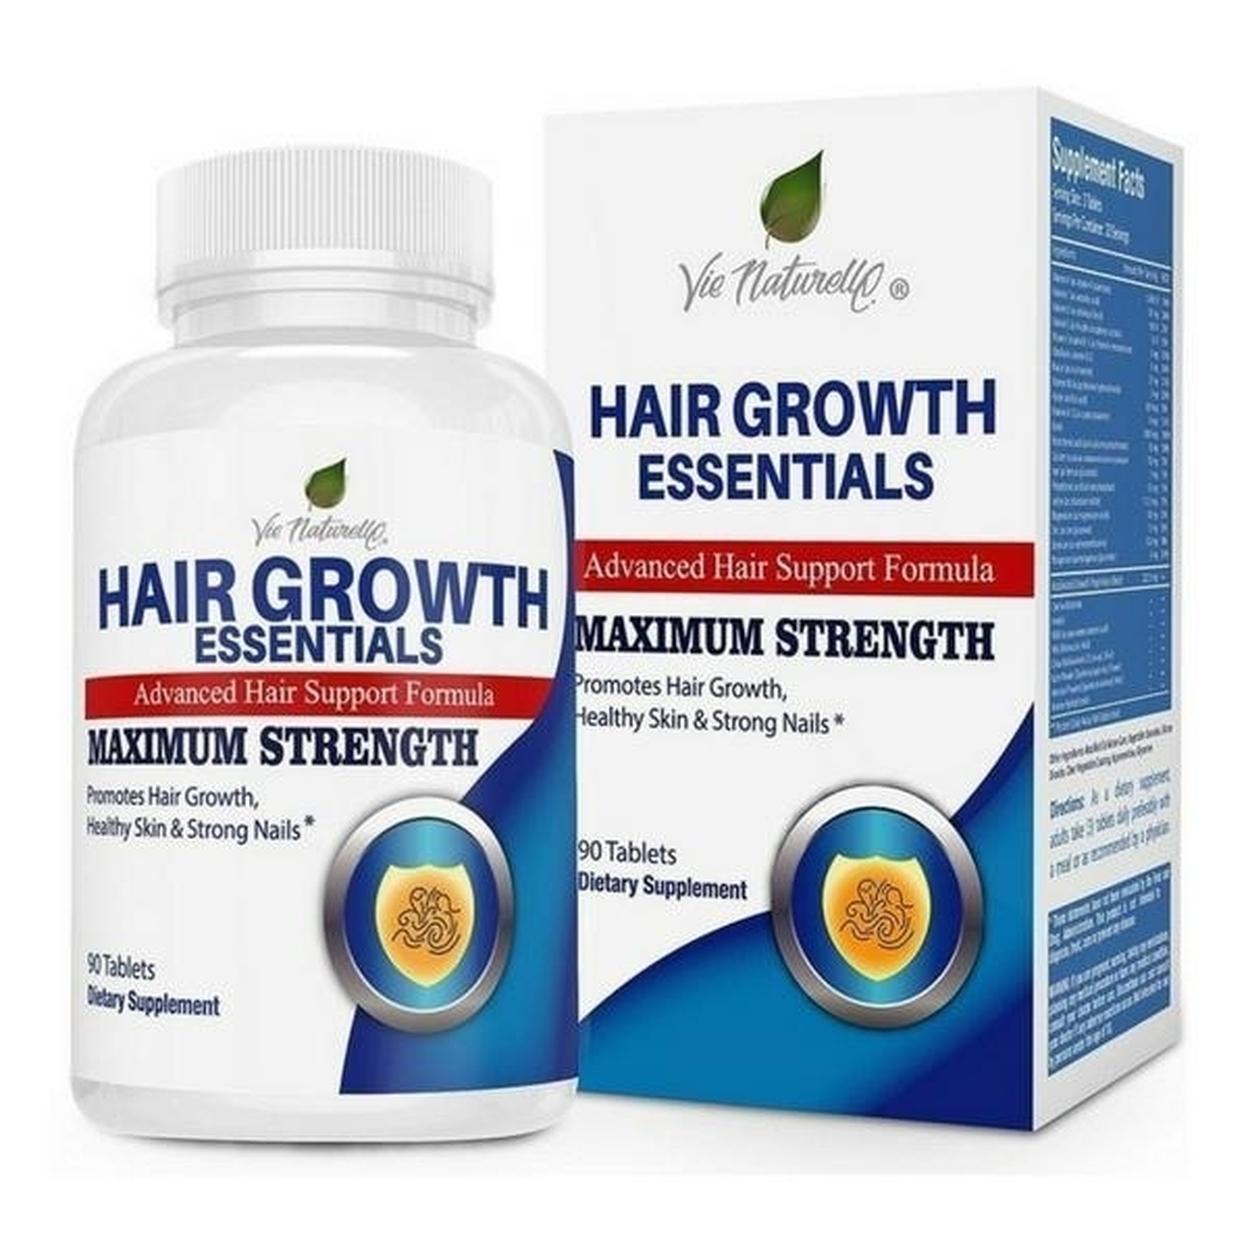 Hair Growth Essentials 58f7956bc98fc462b2776303